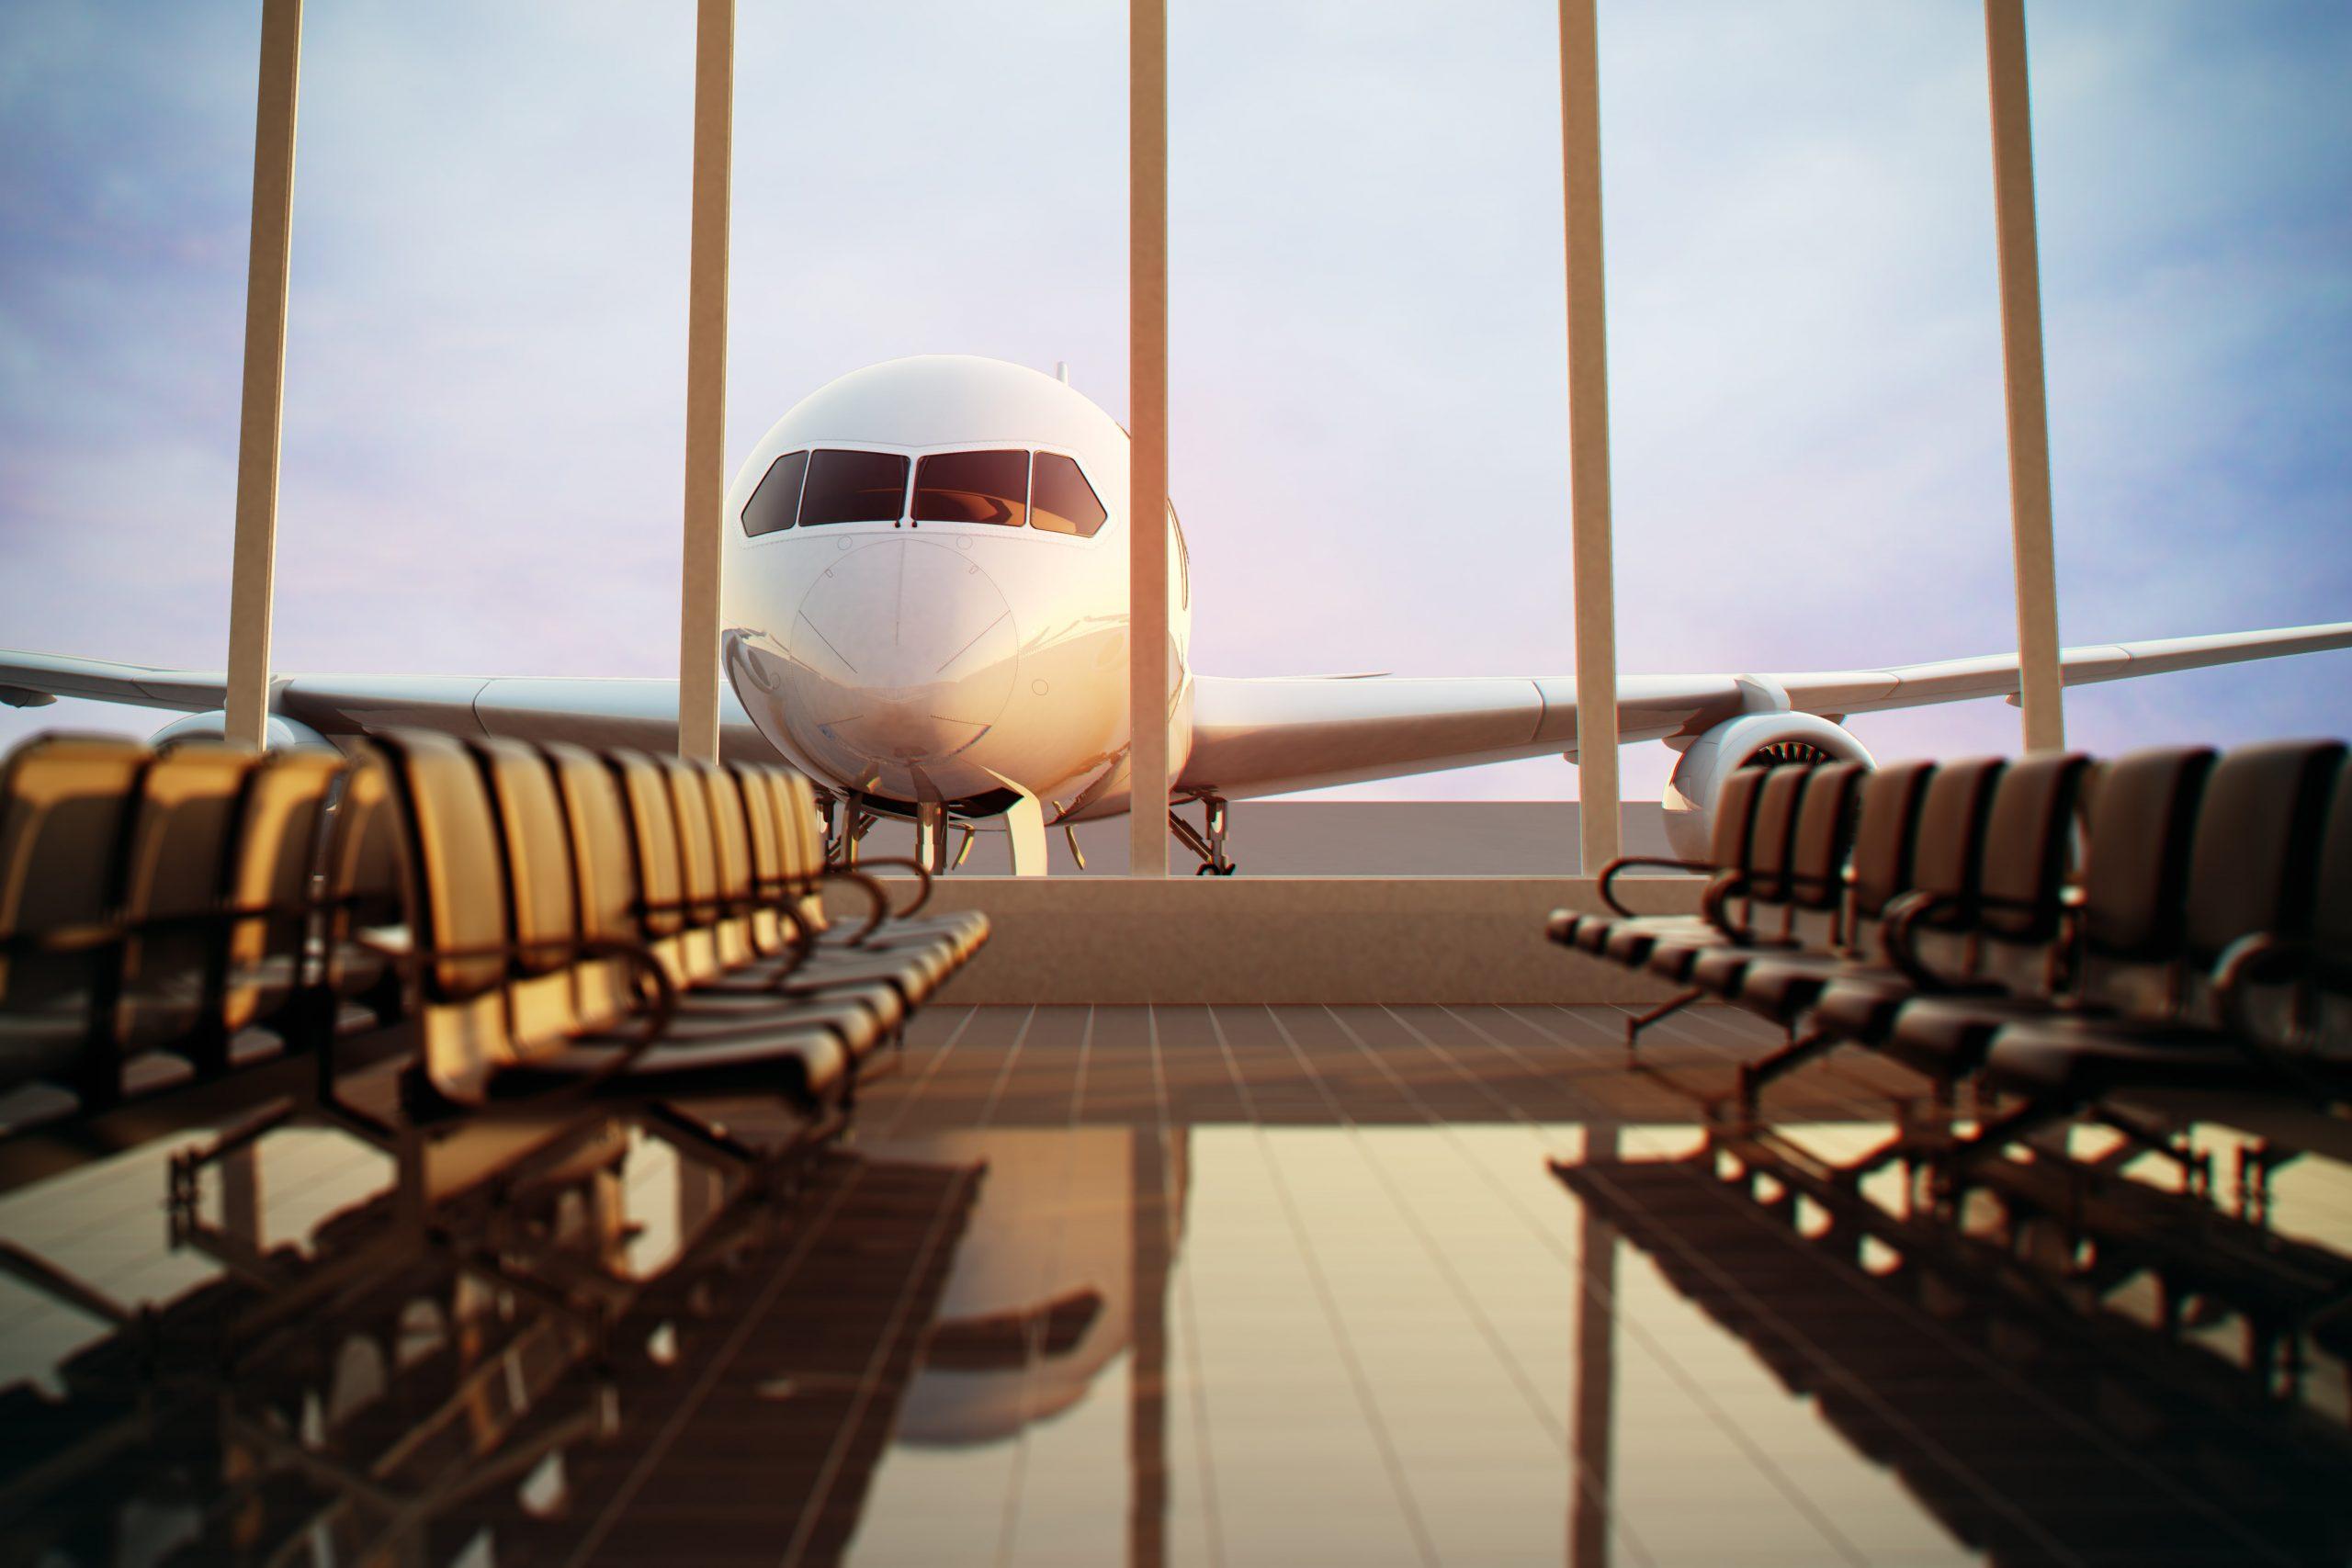 Plane at TF Green Airport